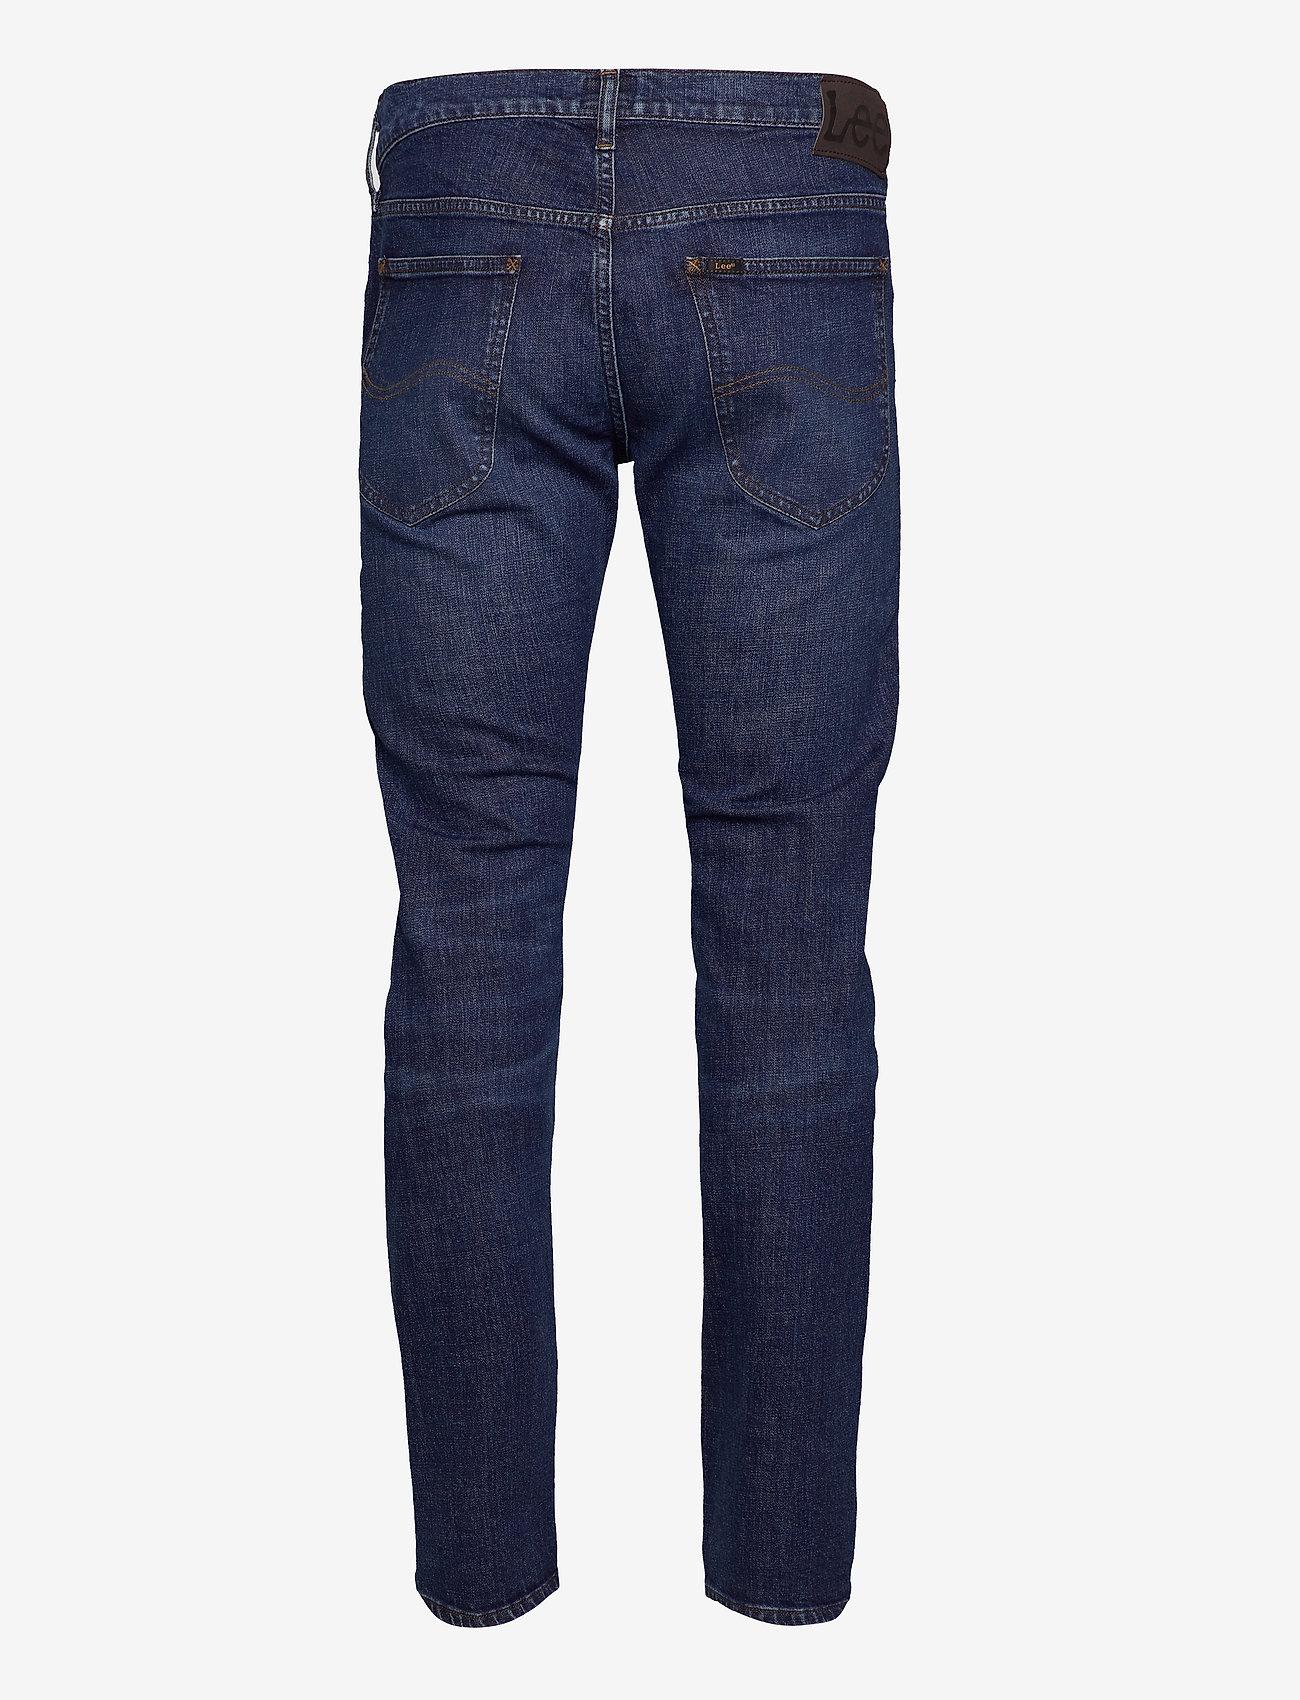 Lee Jeans - DAREN ZIP FLY - slim jeans - mid foam - 1